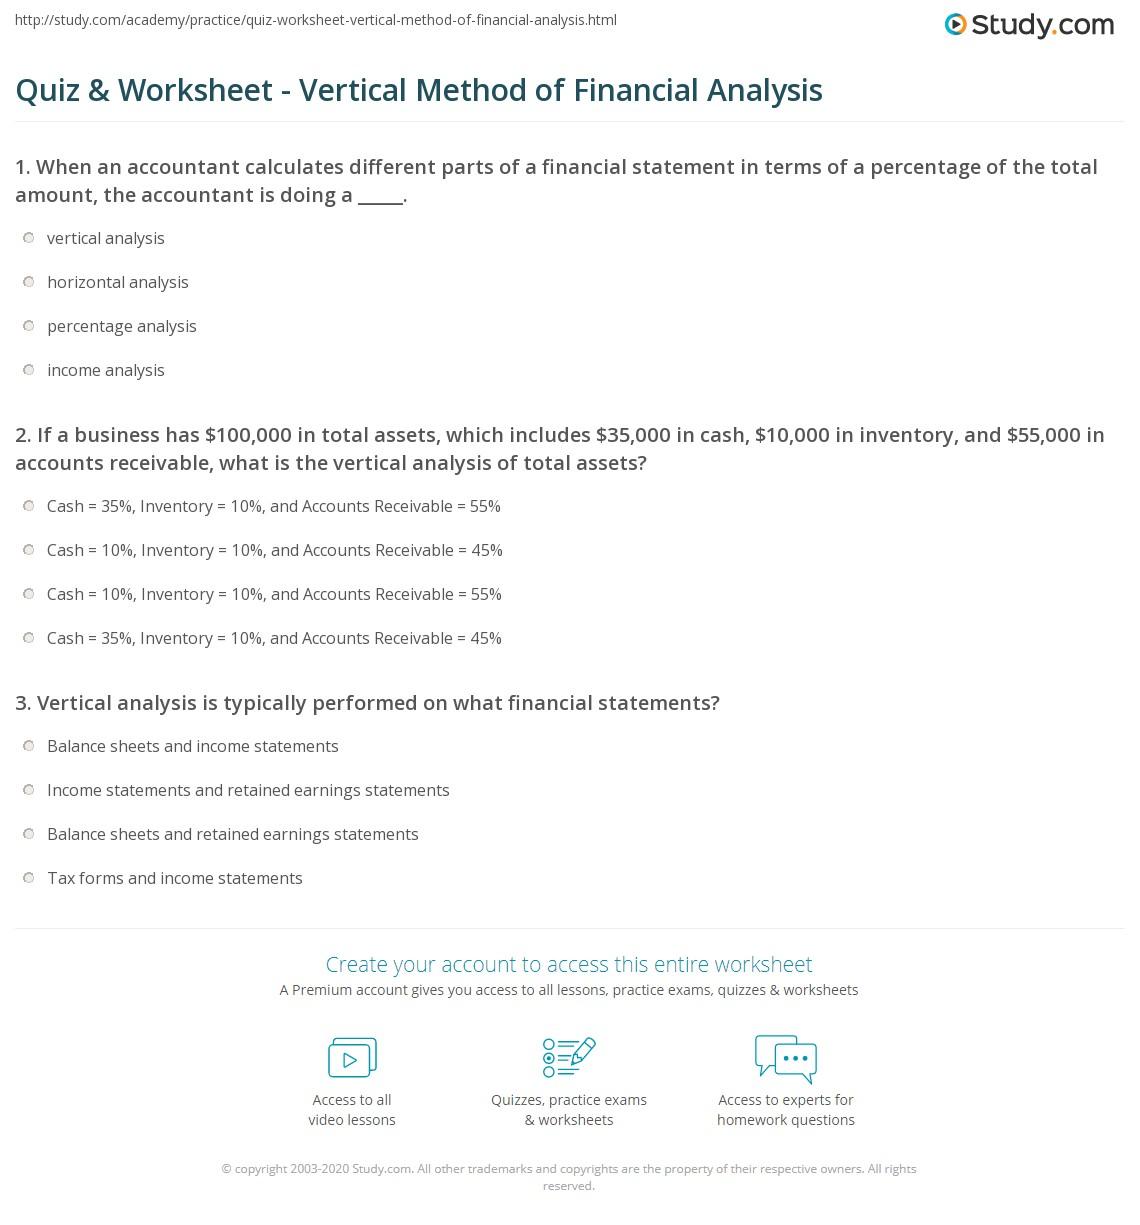 Quiz W Ksheet Vertic L Method Of F Nci L N Lysis Study